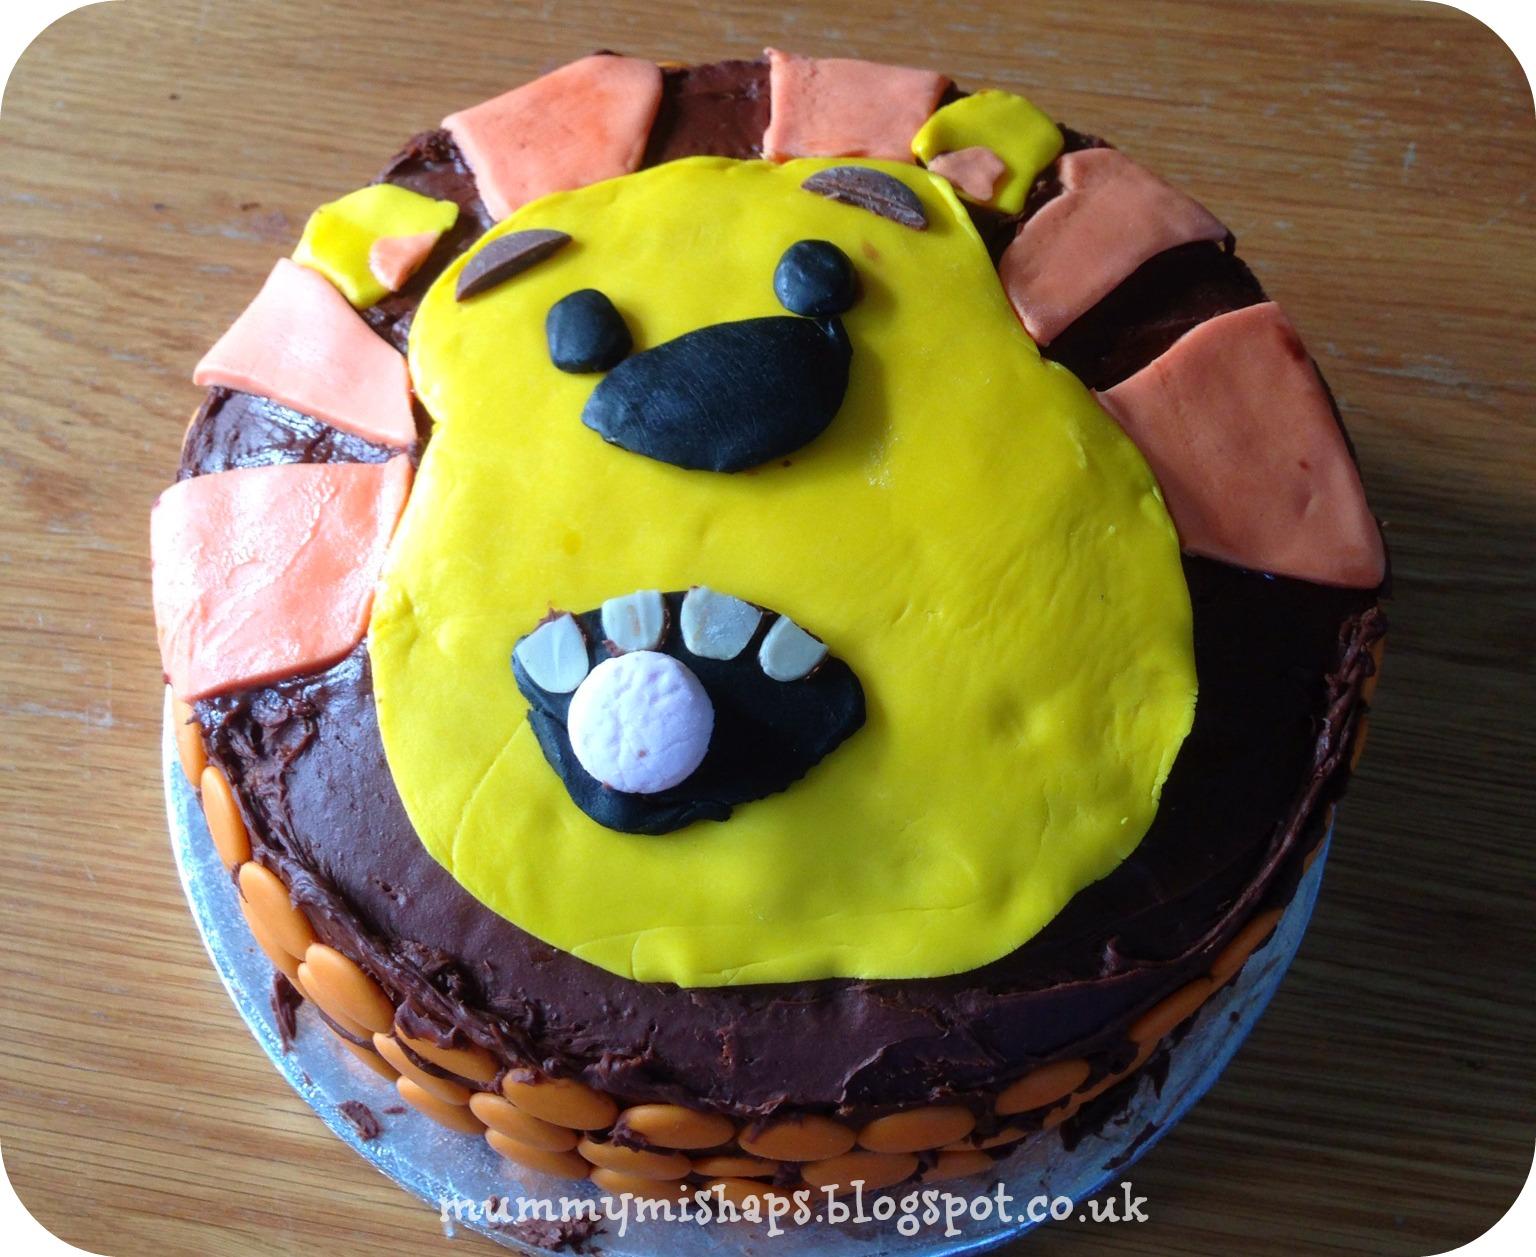 Miraculous 9 Food Lion Princess Birthday Cakes Photo Graduation Sheet Cake Funny Birthday Cards Online Hetedamsfinfo